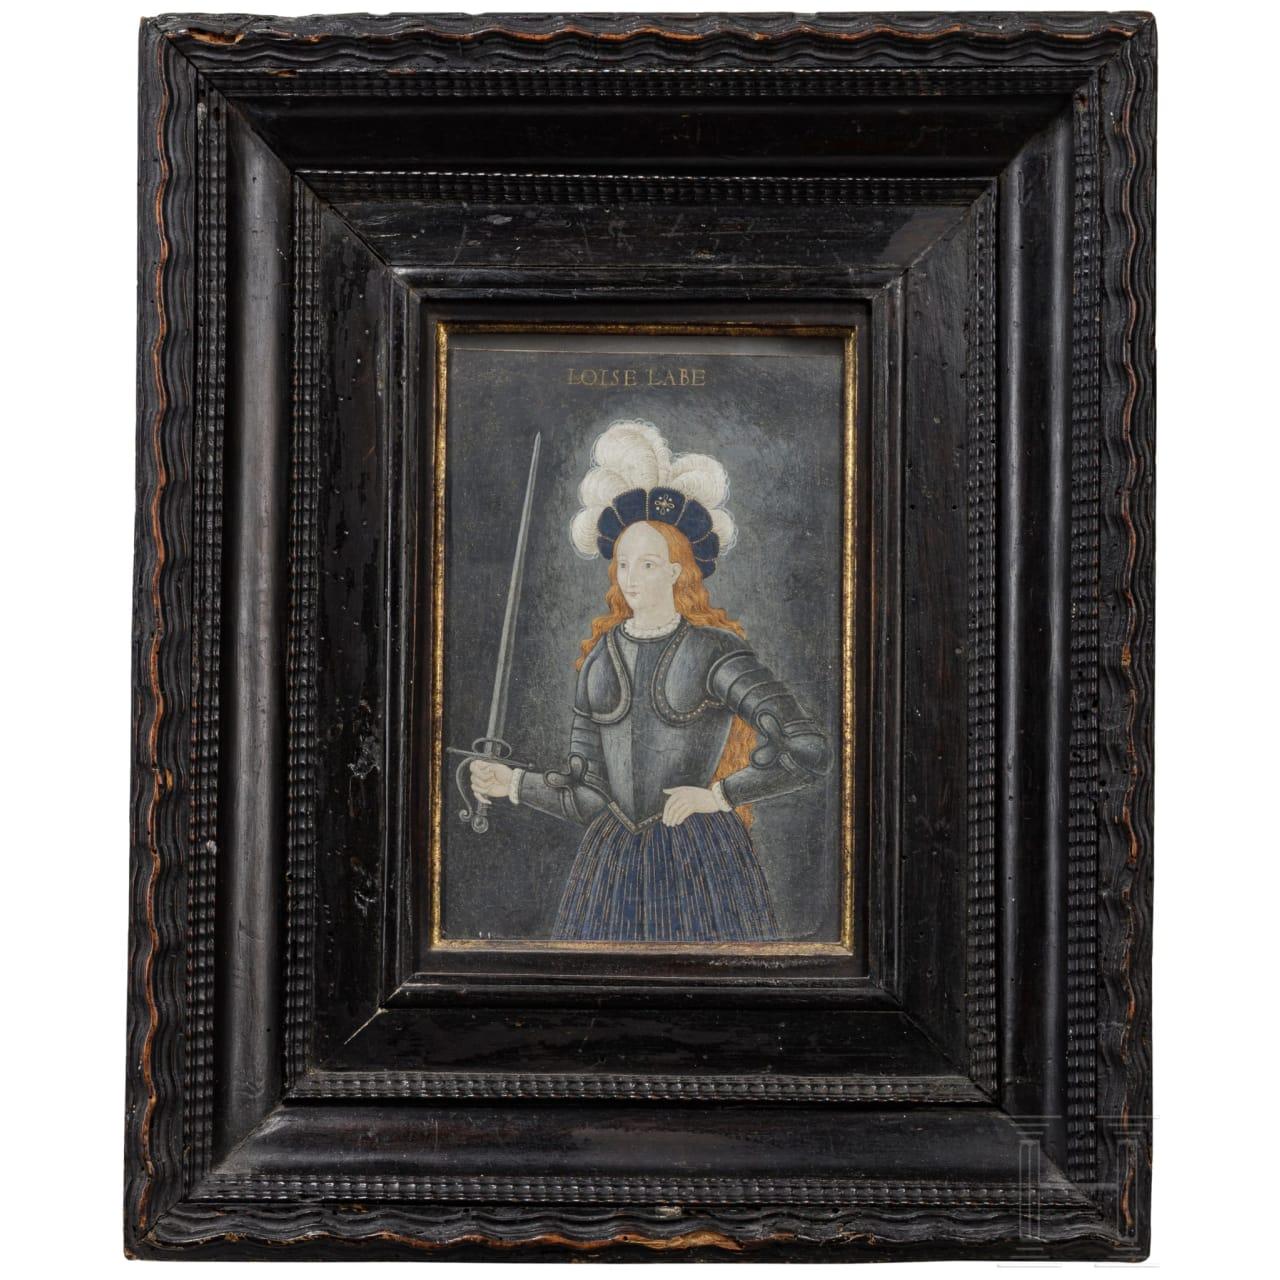 A French portrait of Louise Labé, 16th century